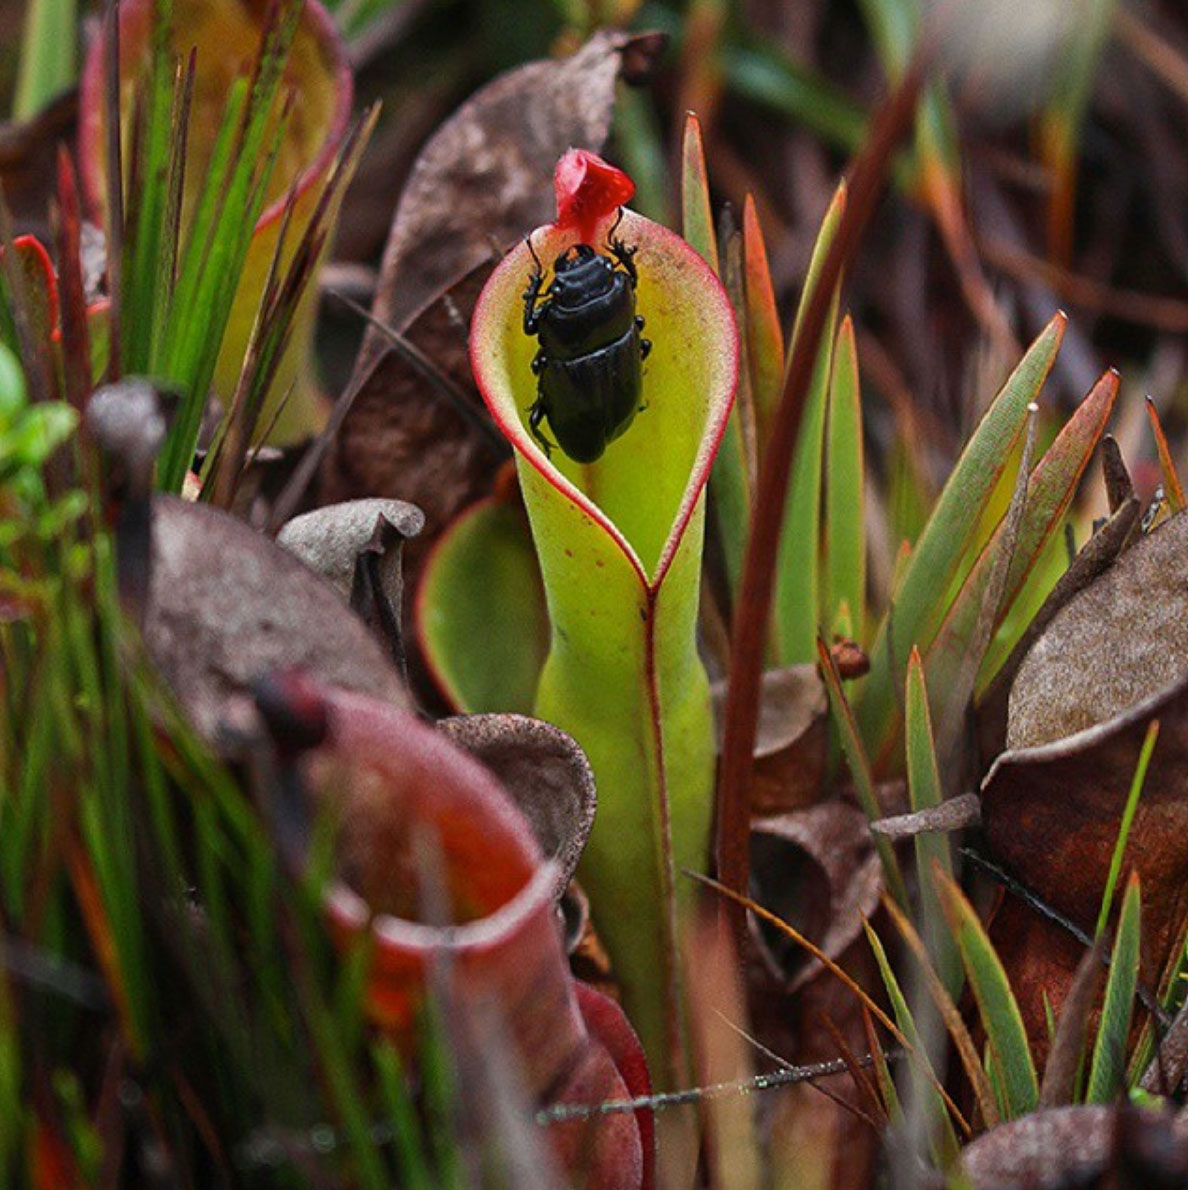 Prehistoric nature in the Roraima